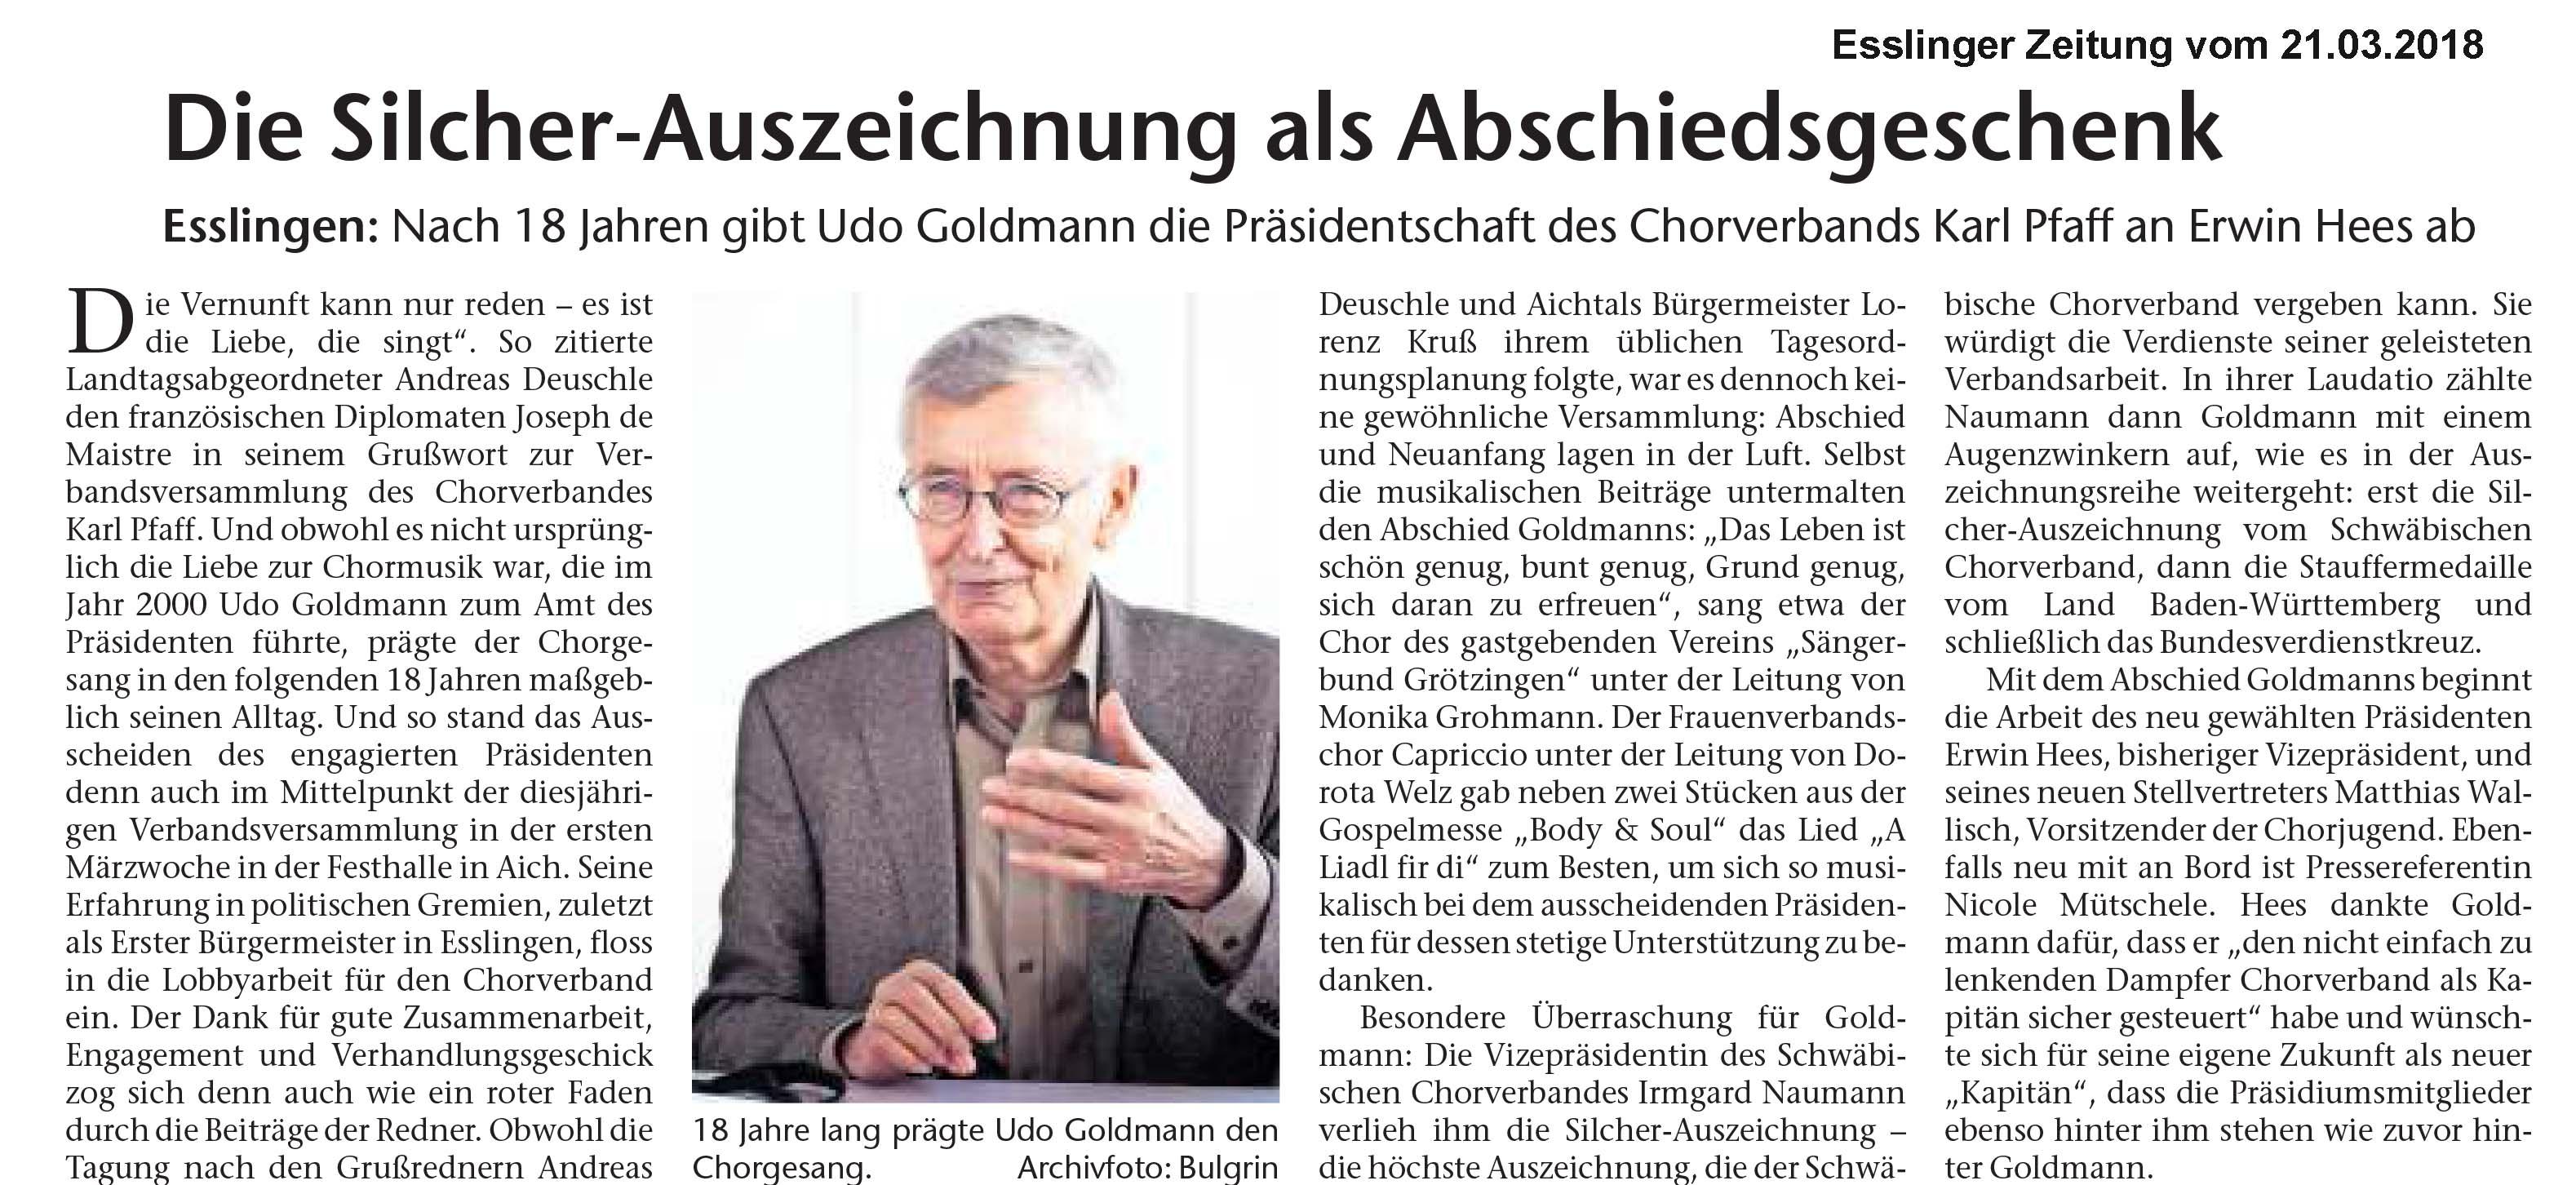 Udo Goldmann